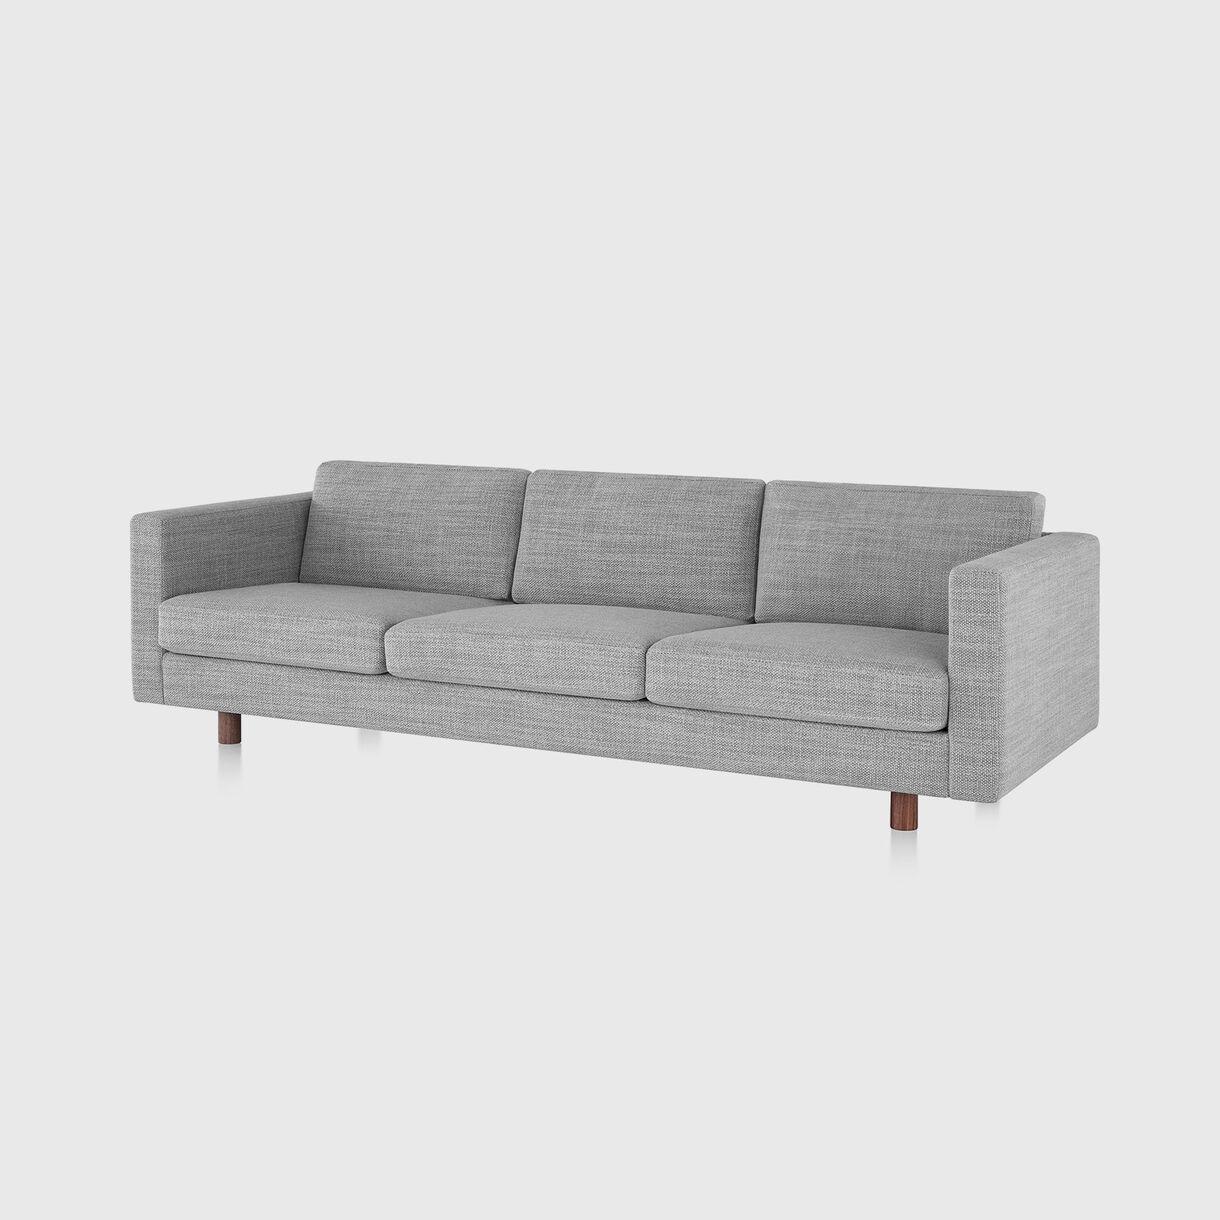 Lispenard Sofa, Capri Light Silver